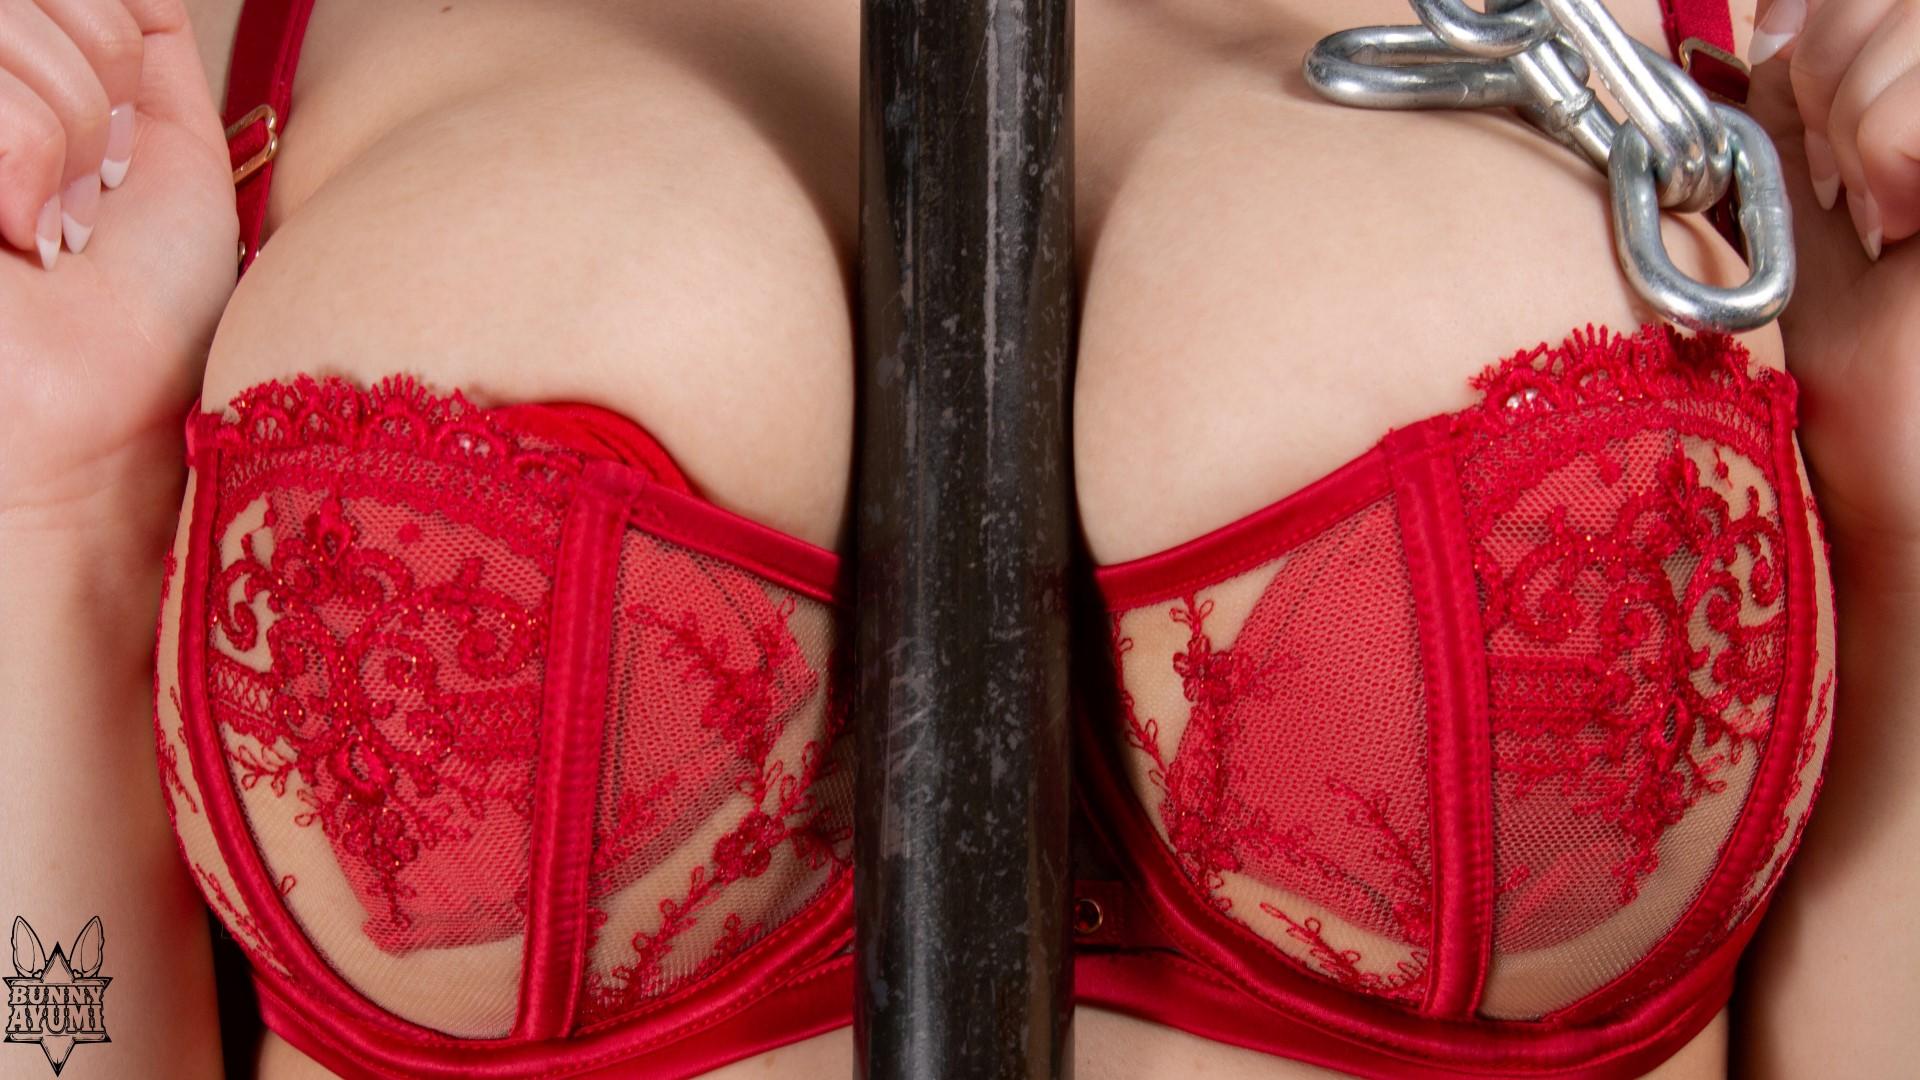 Bunny Ayumi Nude Leaked Vidoes and Naked Pics! 44